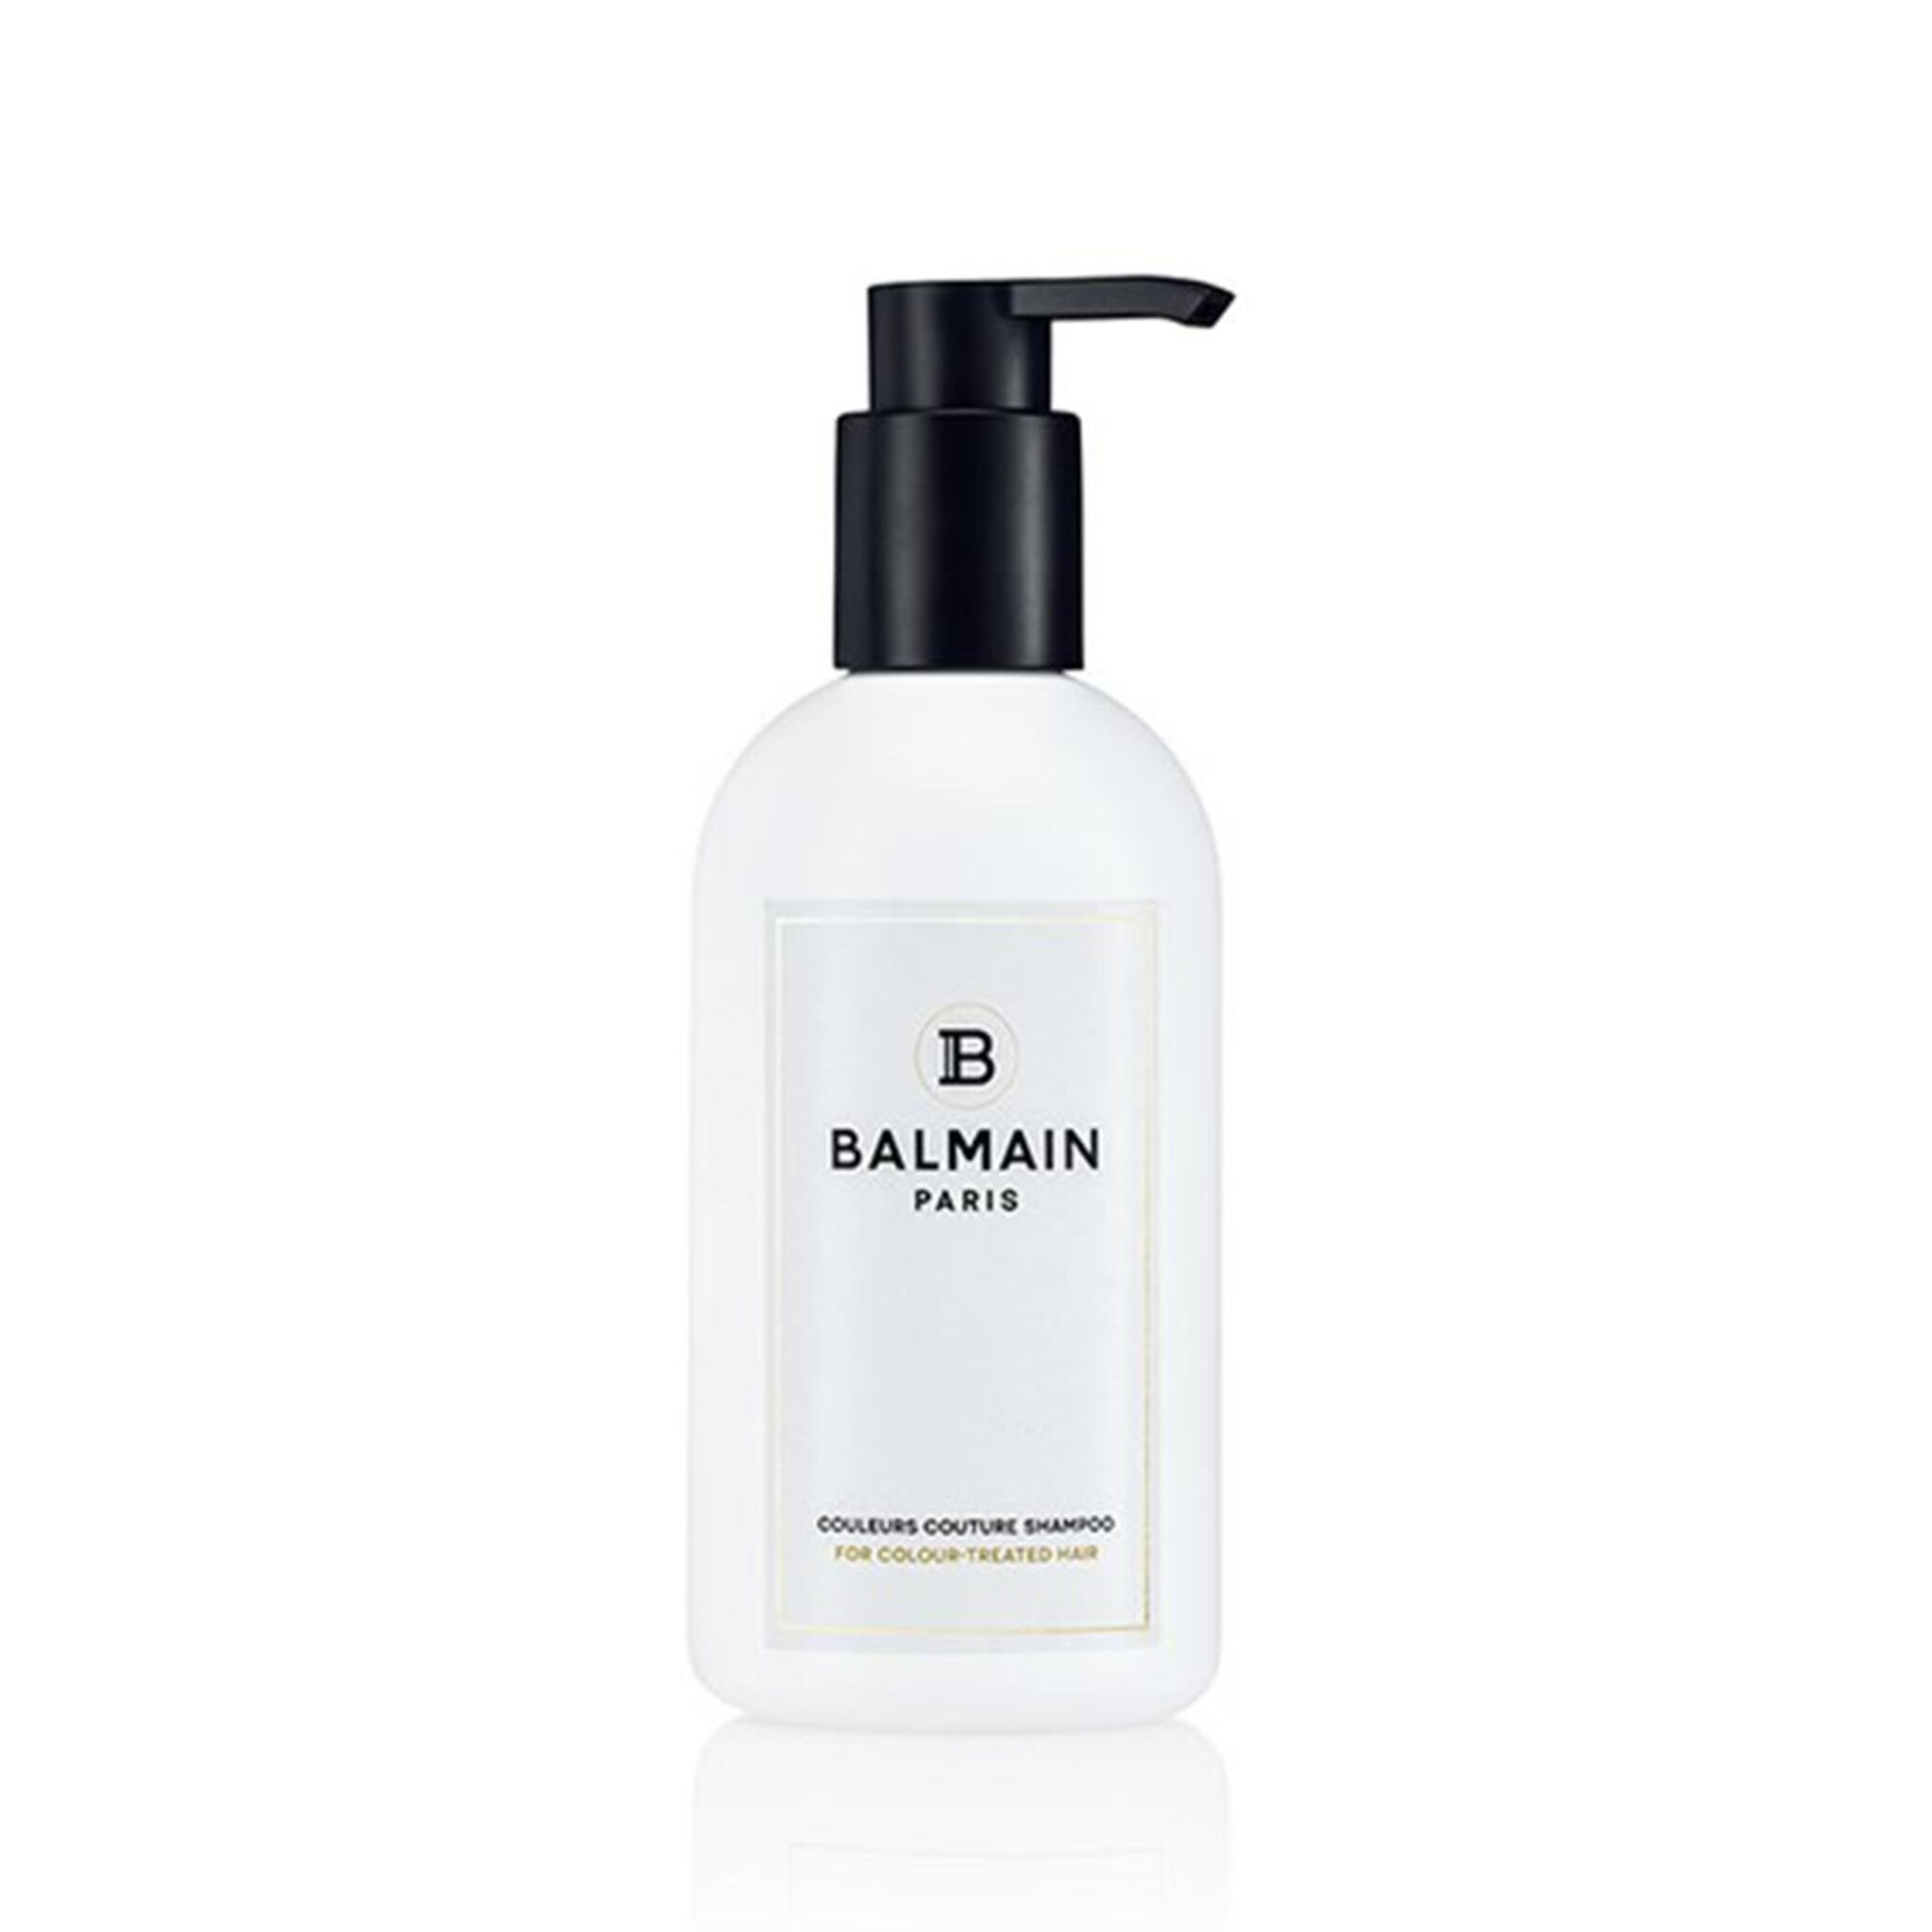 Balmain Paris Couleurs Couture Shampoo